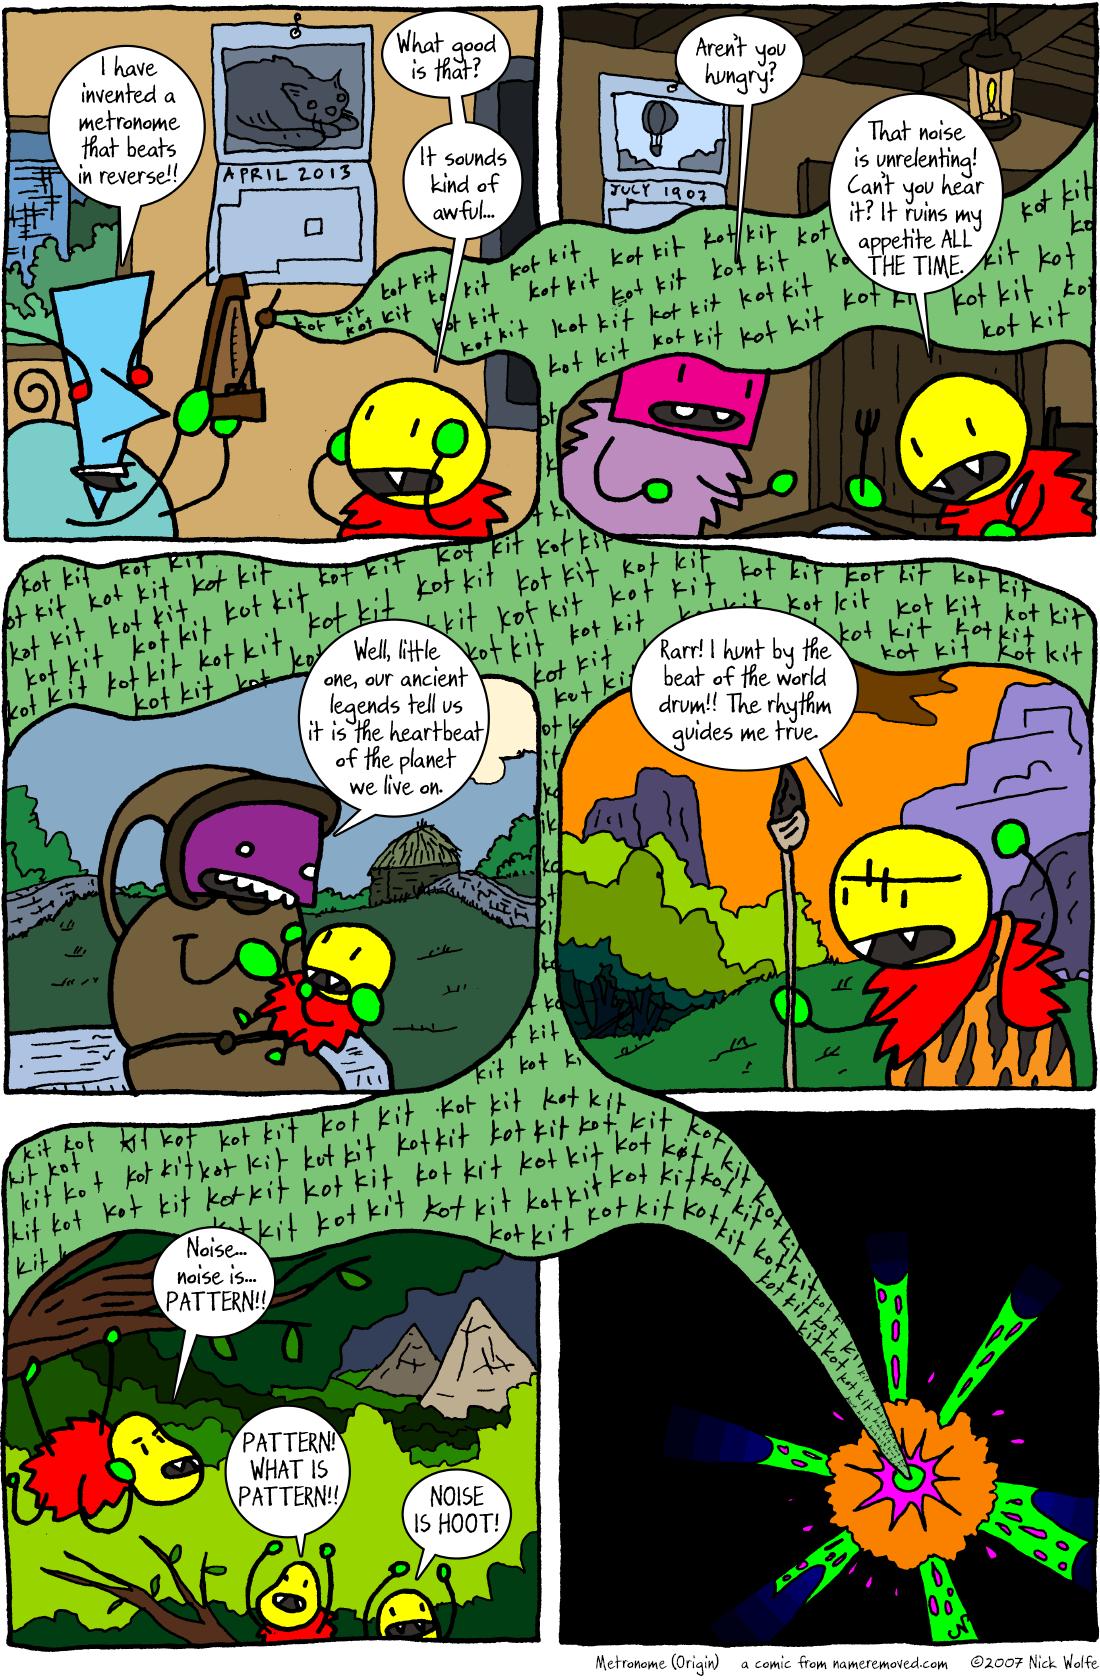 Metronome (Origin)